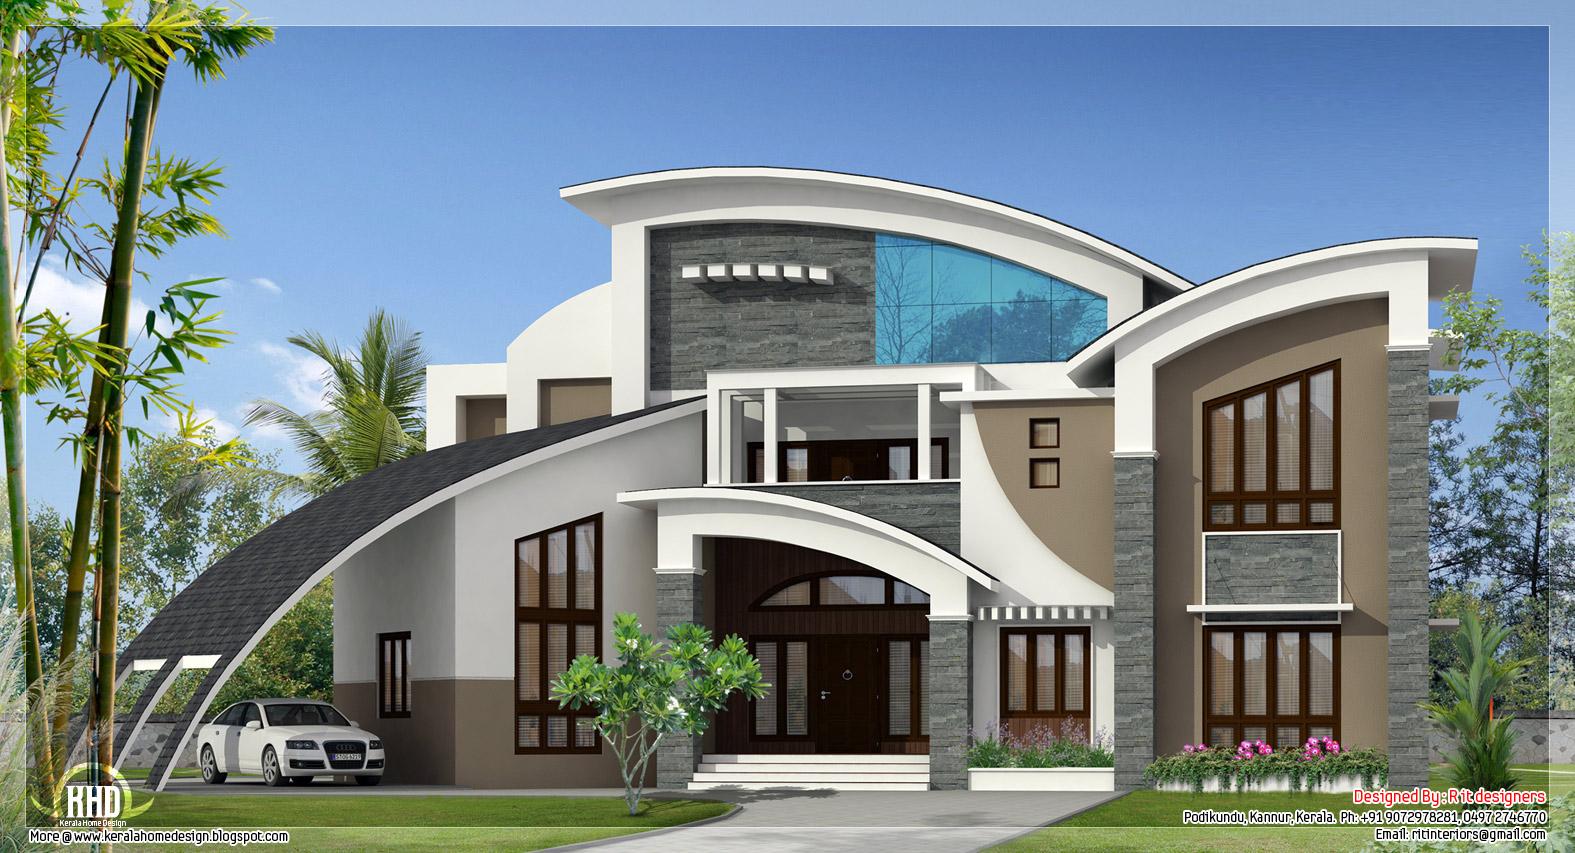 Unique Home Design 18523 Hd Wallpapers Background   HDesktopscom 1575x853